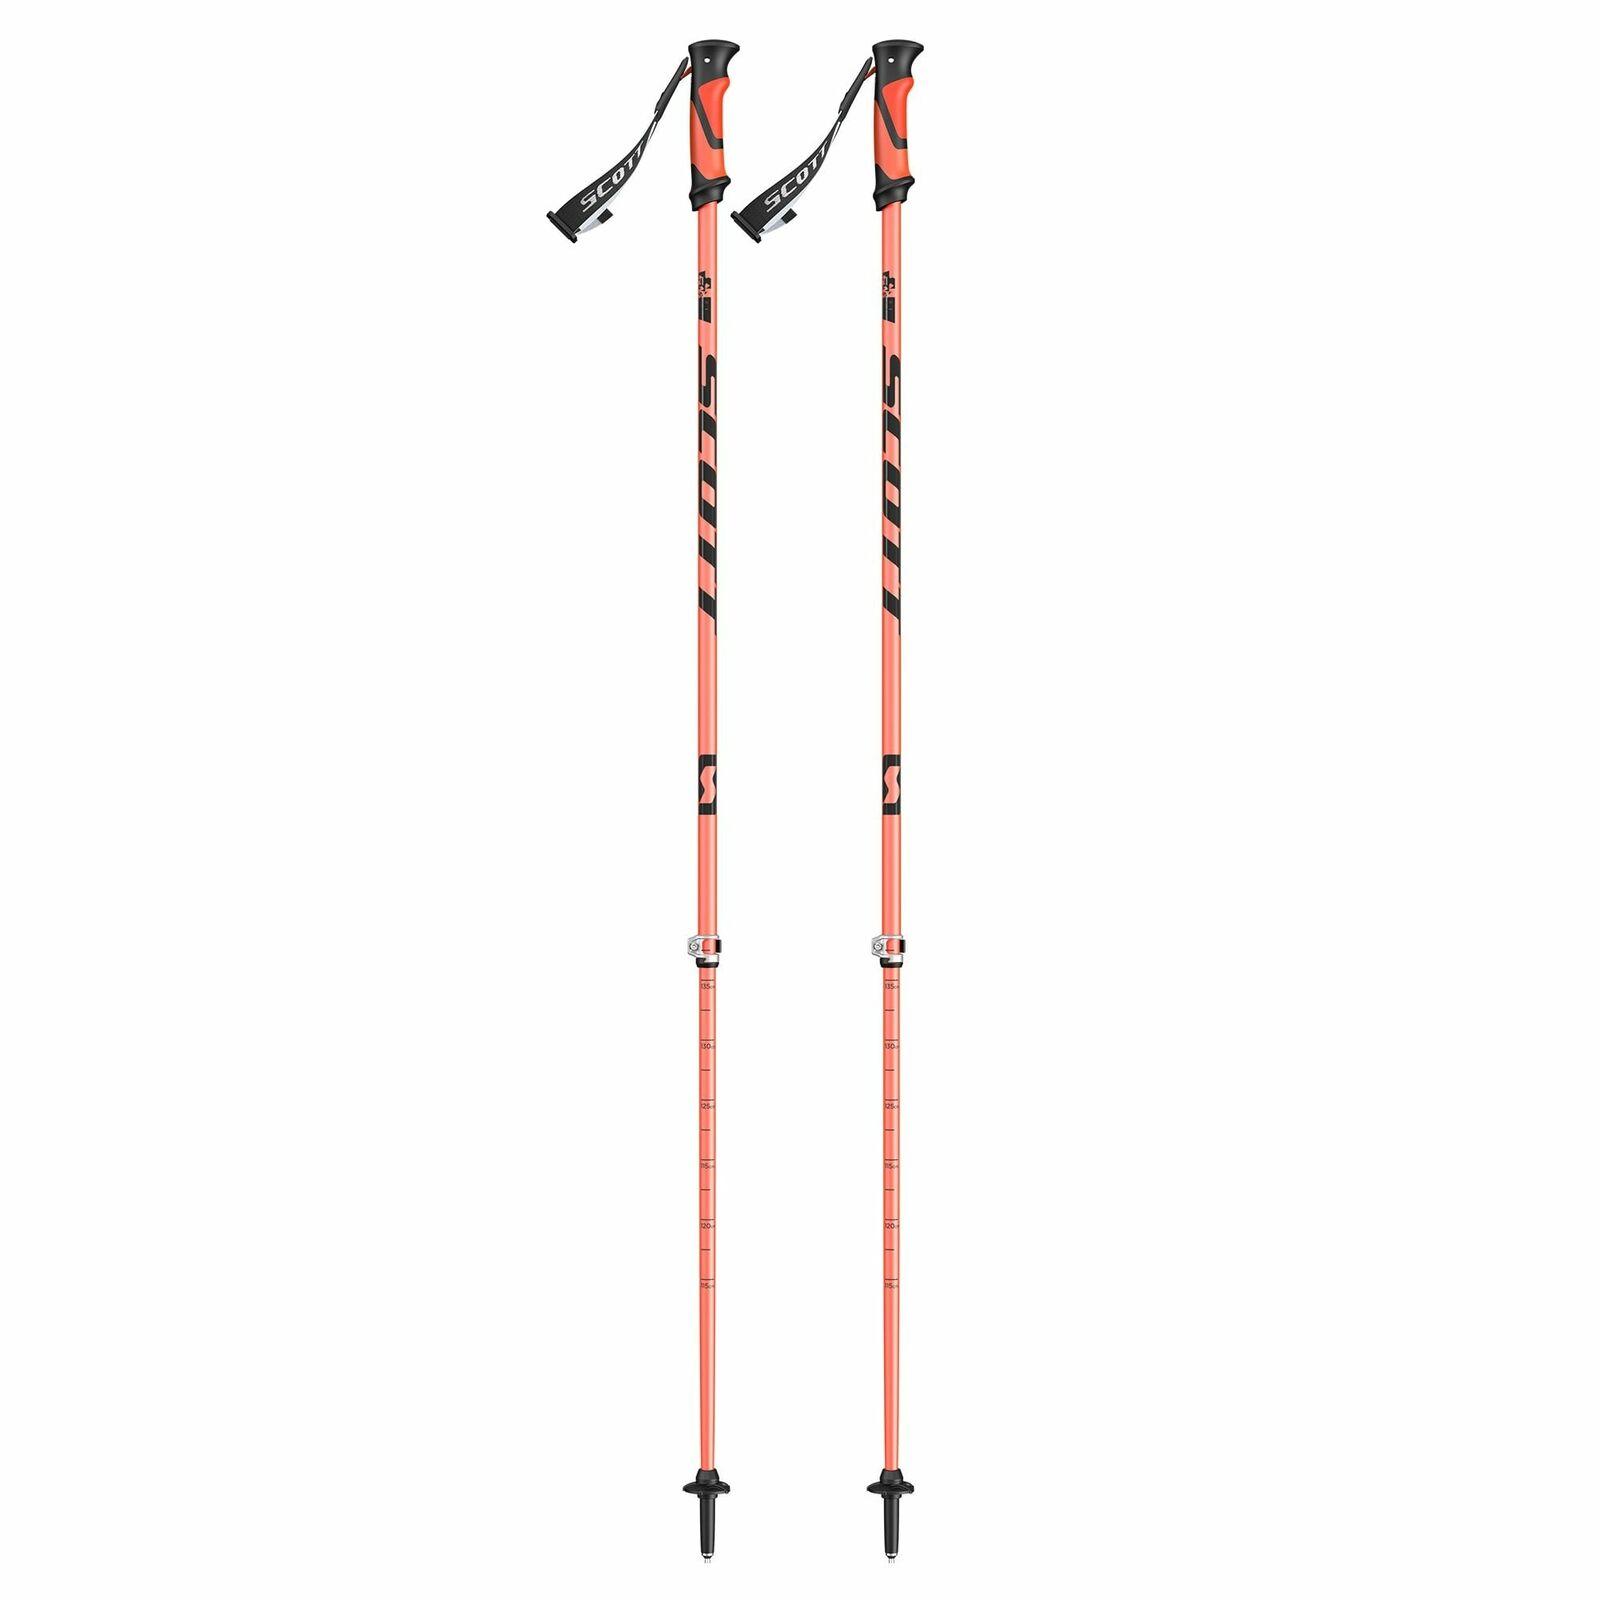 Scott antidisturbios 16 2-parte  poste ajustable de Esquí Touring 115cm-140cm Naranja  los clientes primero